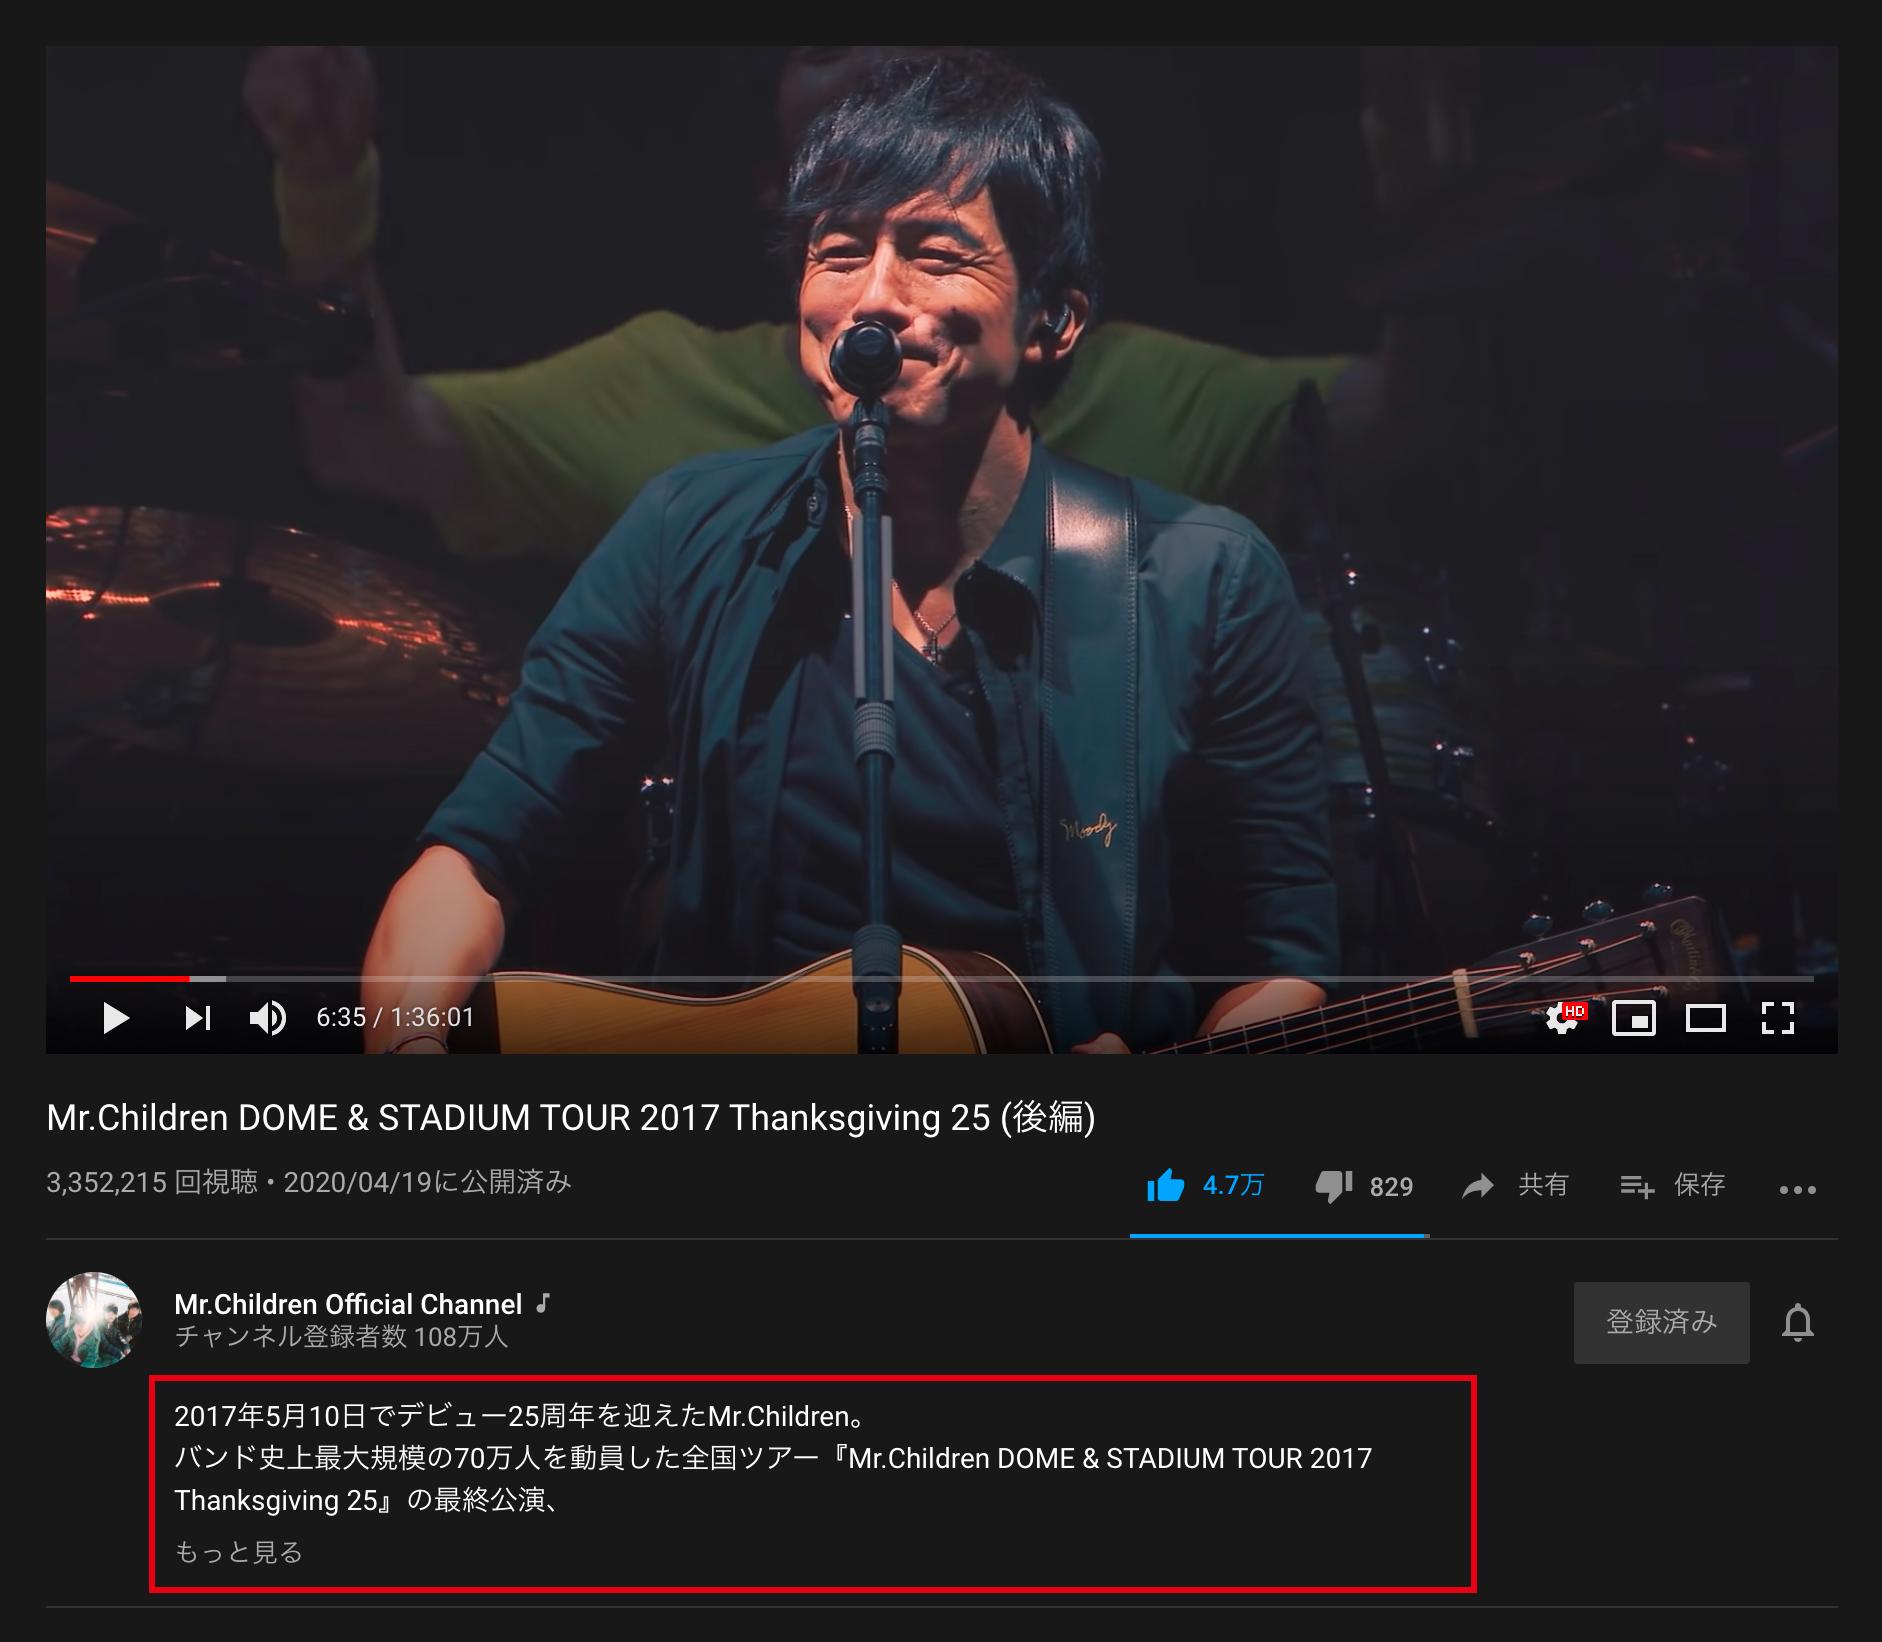 YouTube説明欄 (ページ)